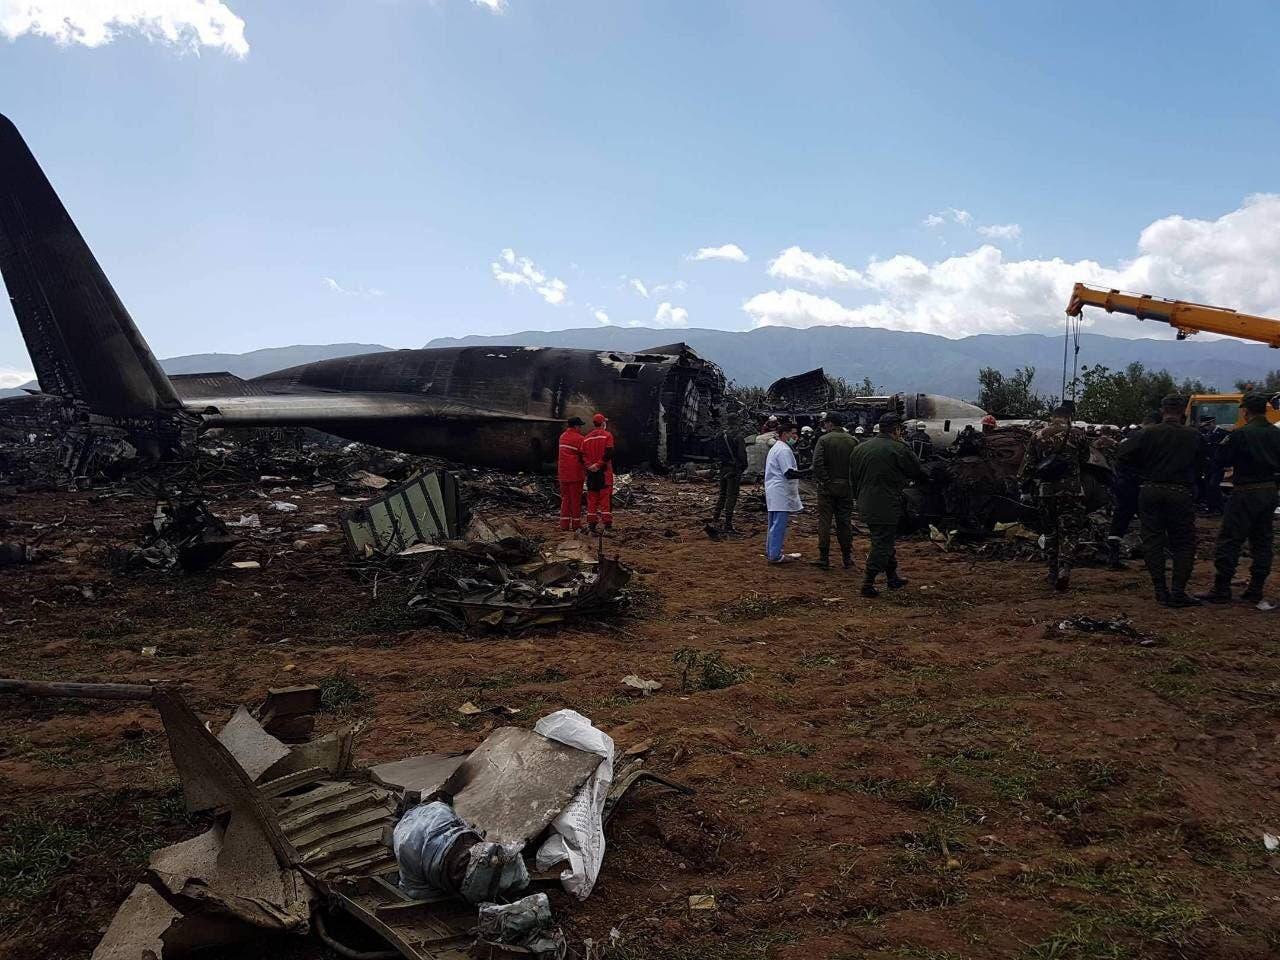 'No survivors' as military plane crashes near Algeria capital